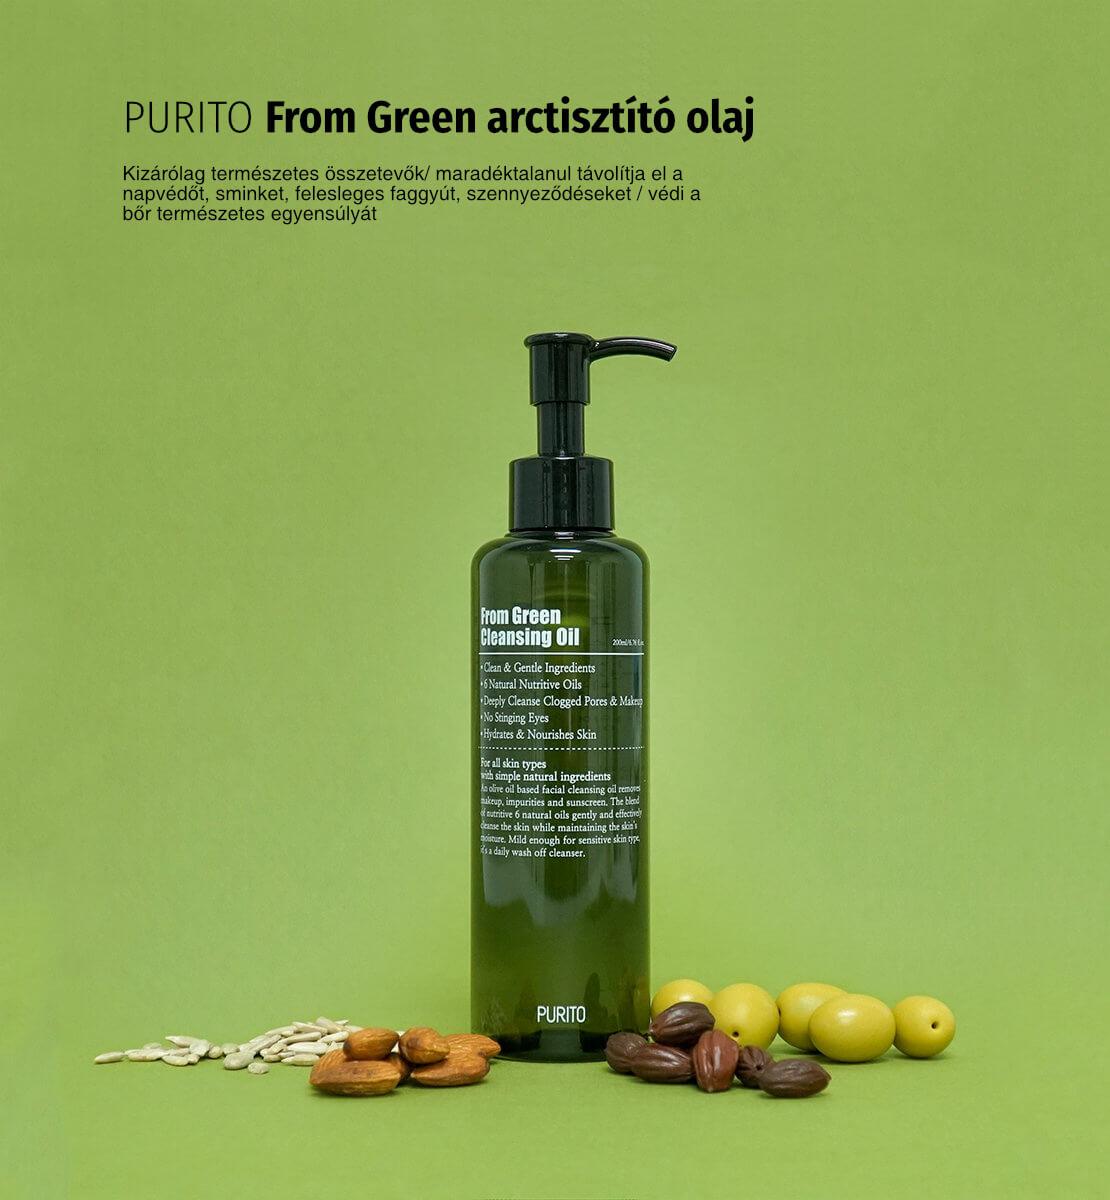 purito-from-greenarctisztito-olaj